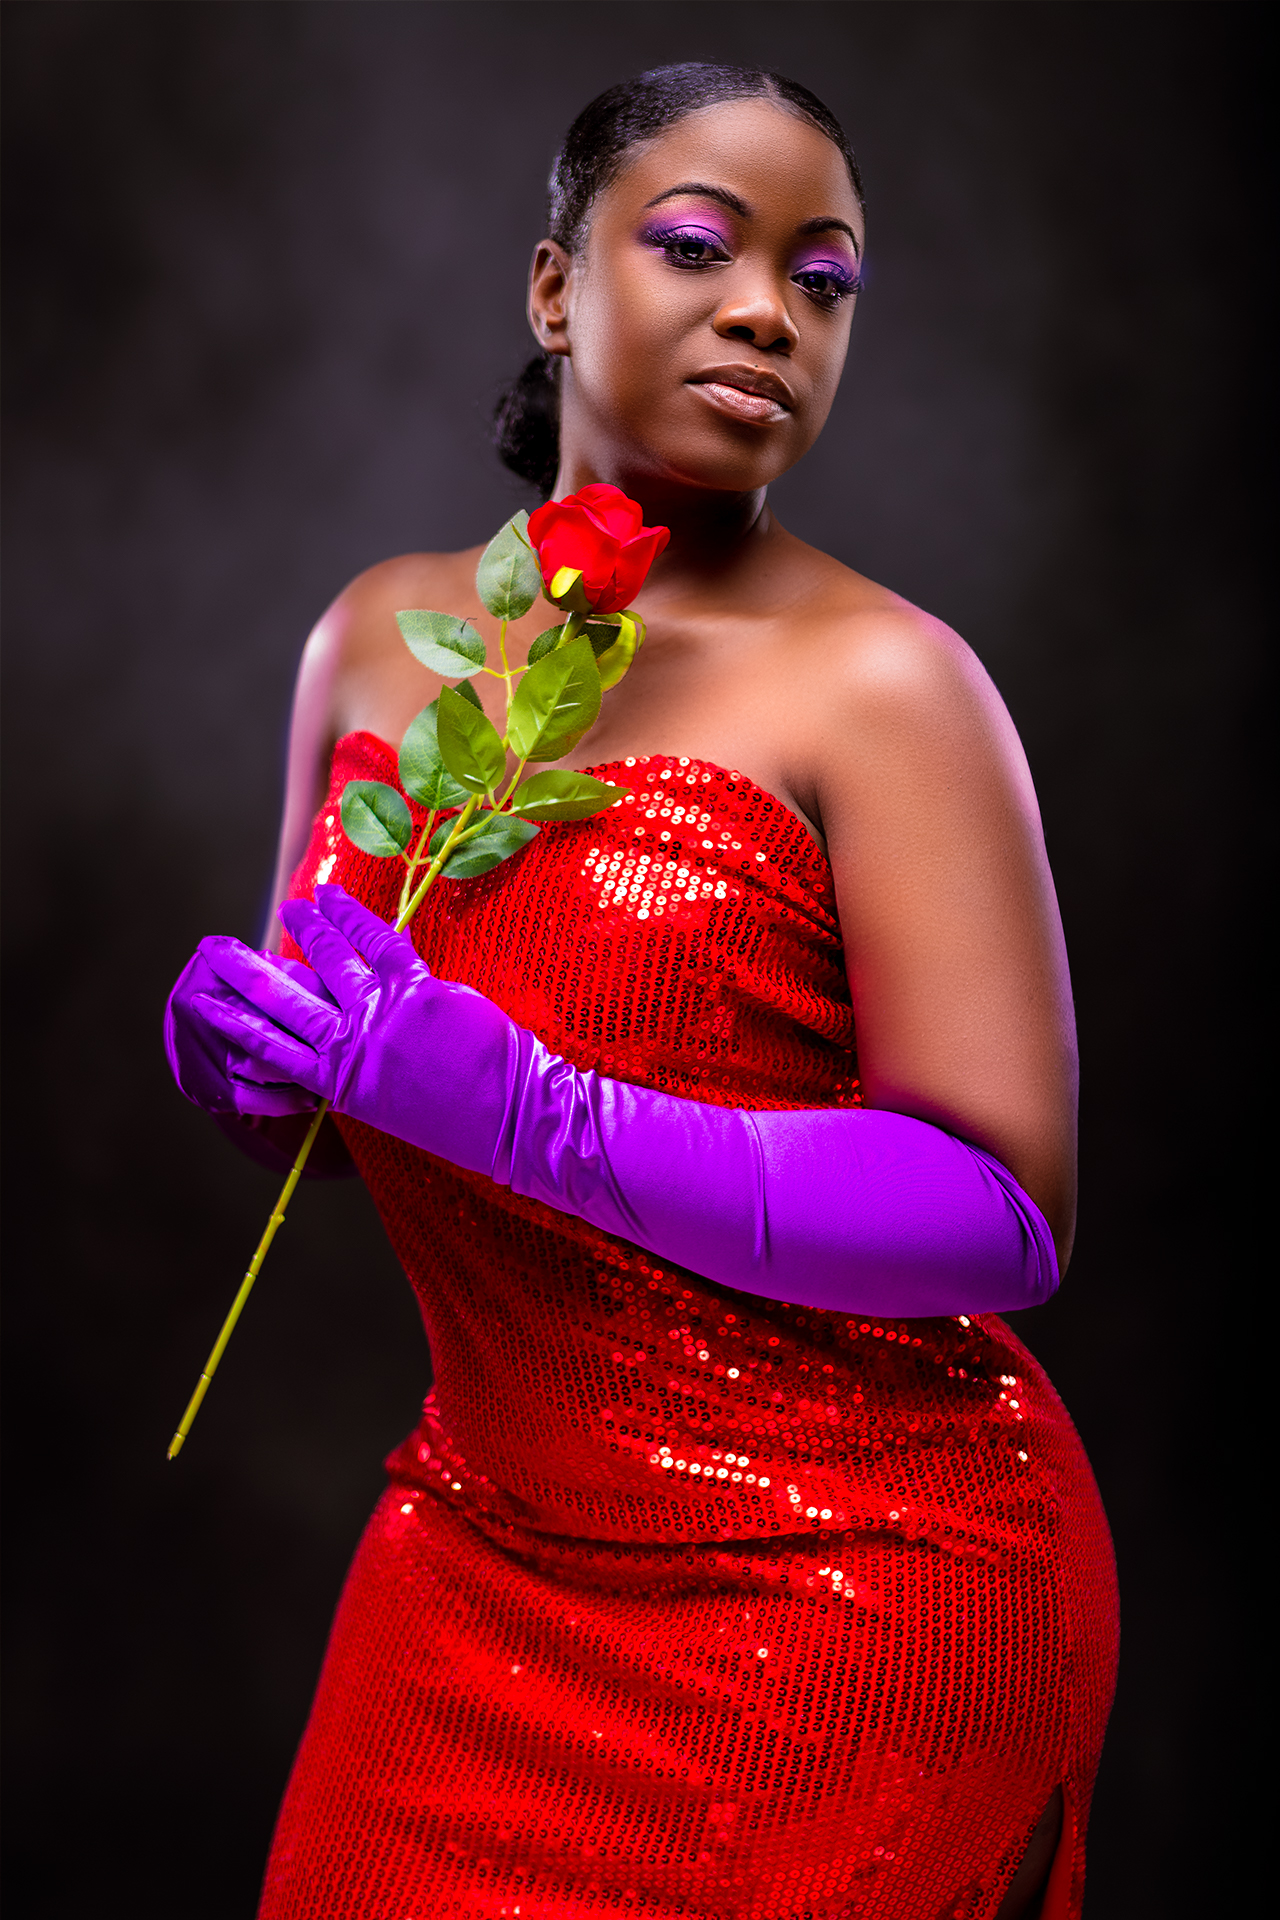 portrait-photography-brooklyn-nyc-black-jessica-rabbit-00707-1